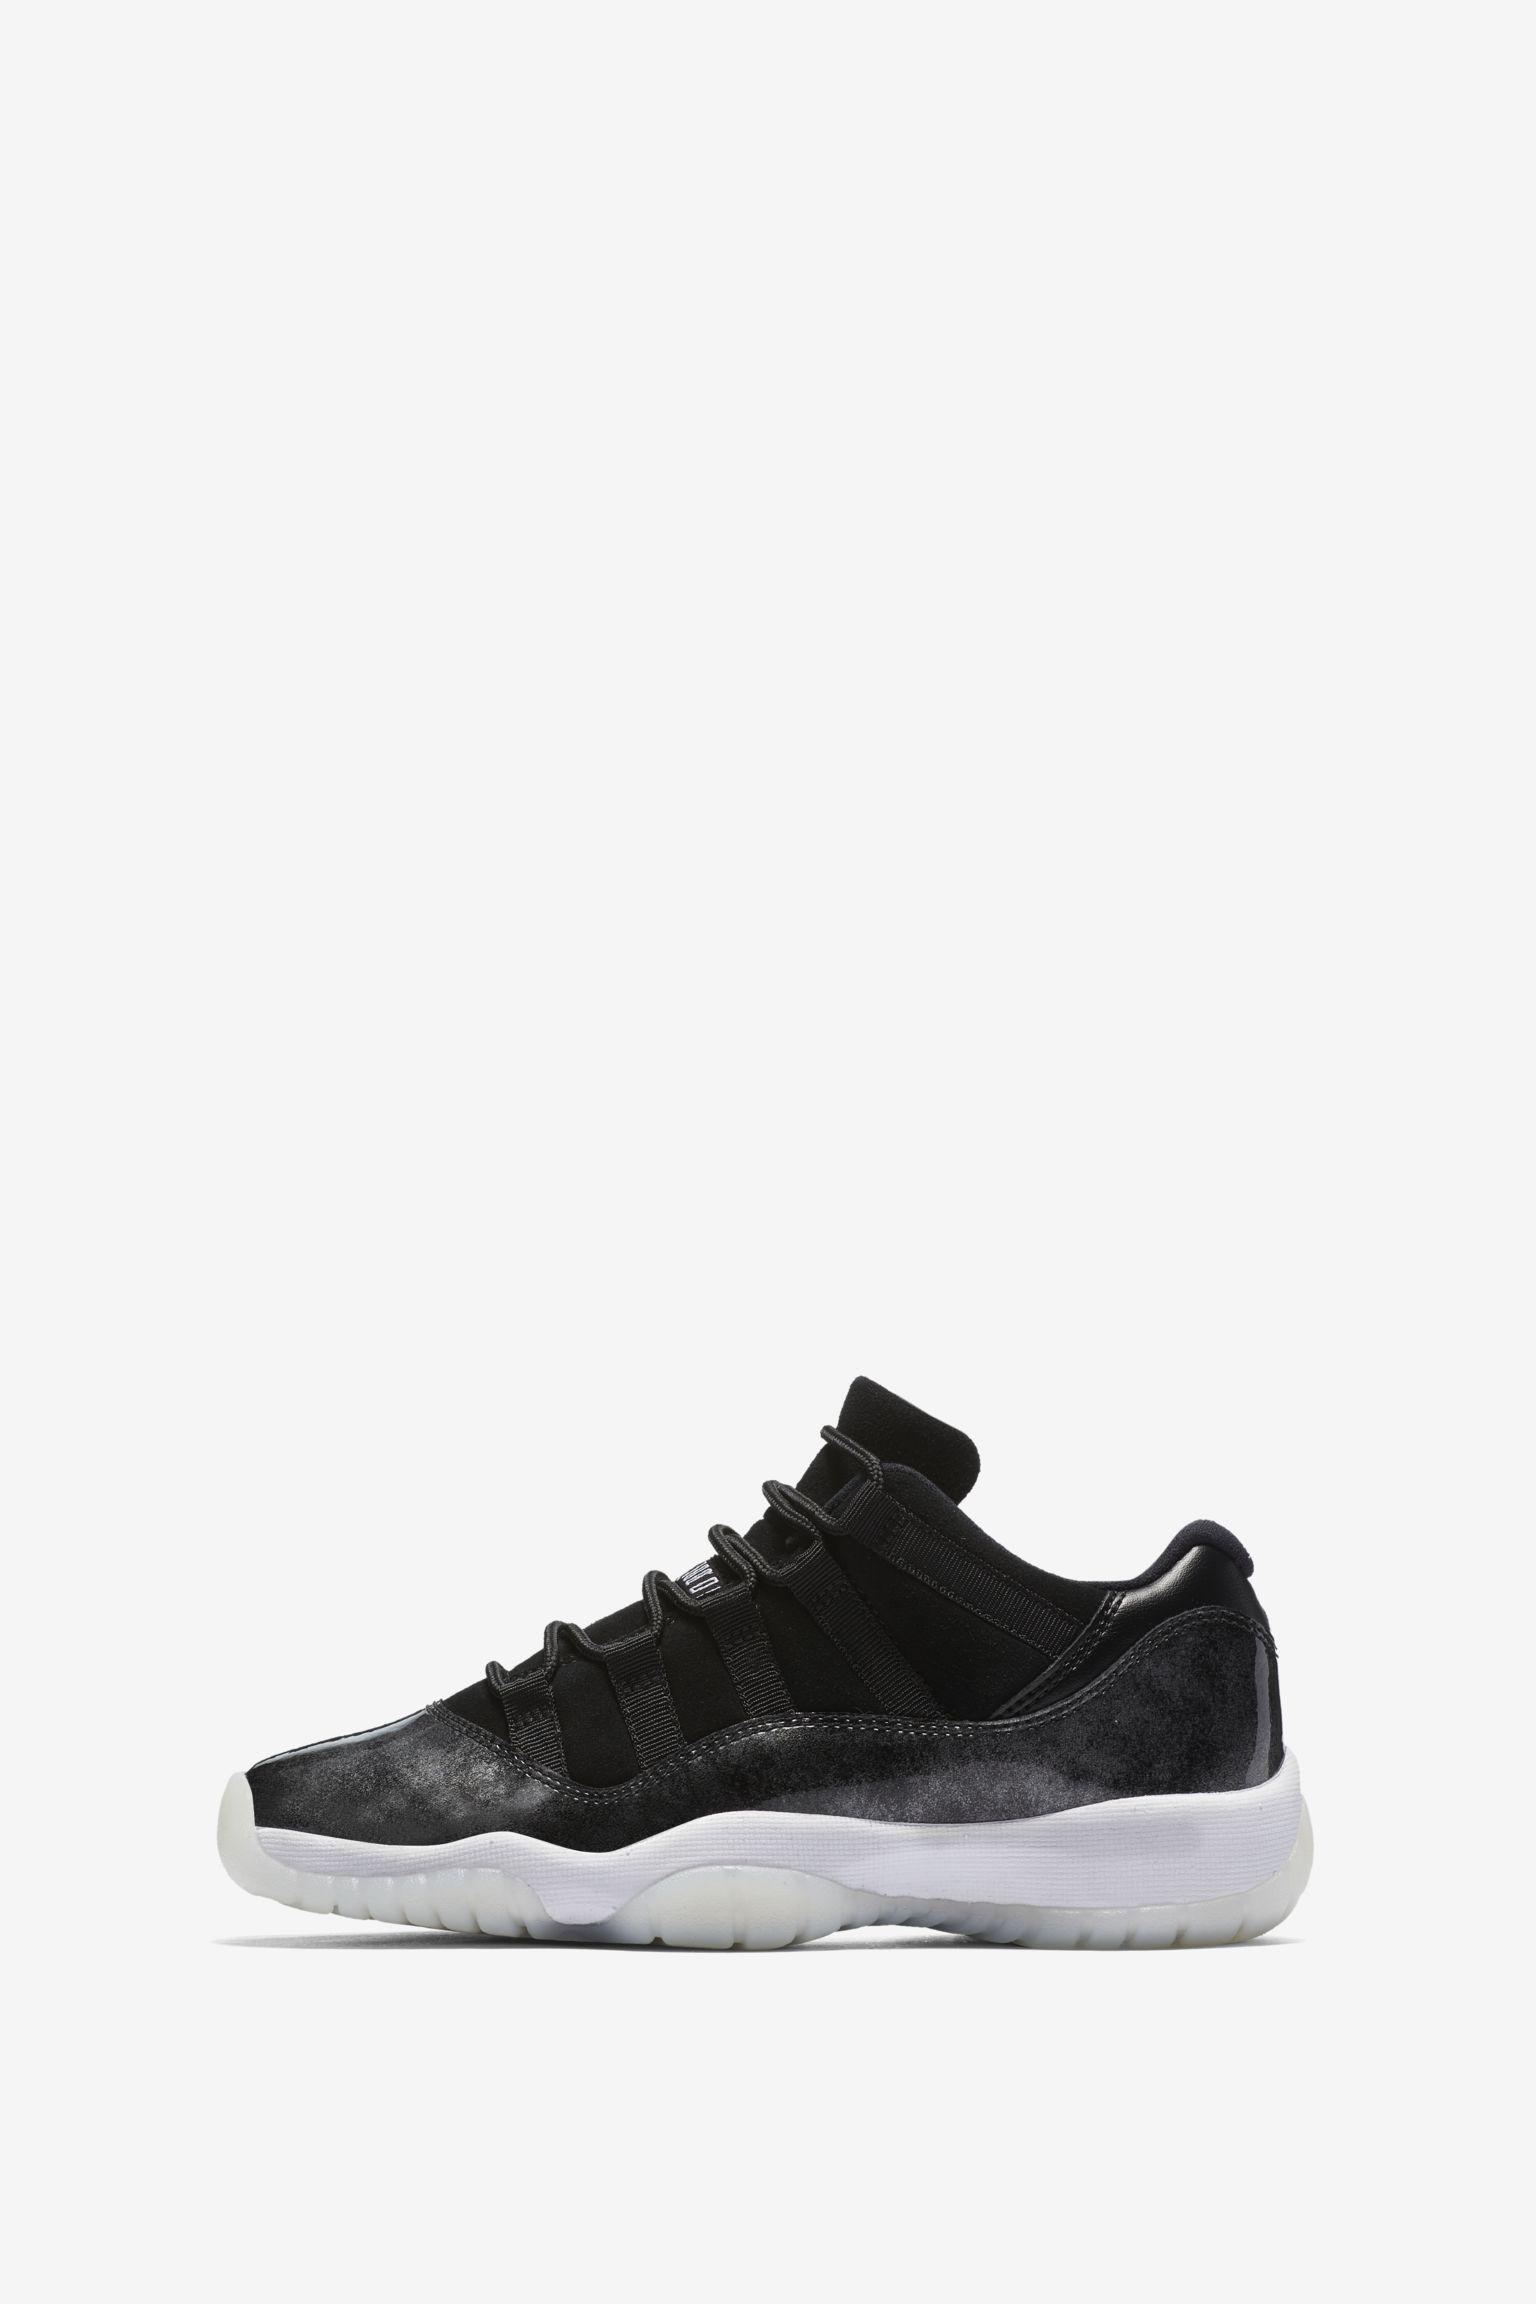 Air Jordan 11 Retro Low 'Black & White' Release Date. Nike SNKRS